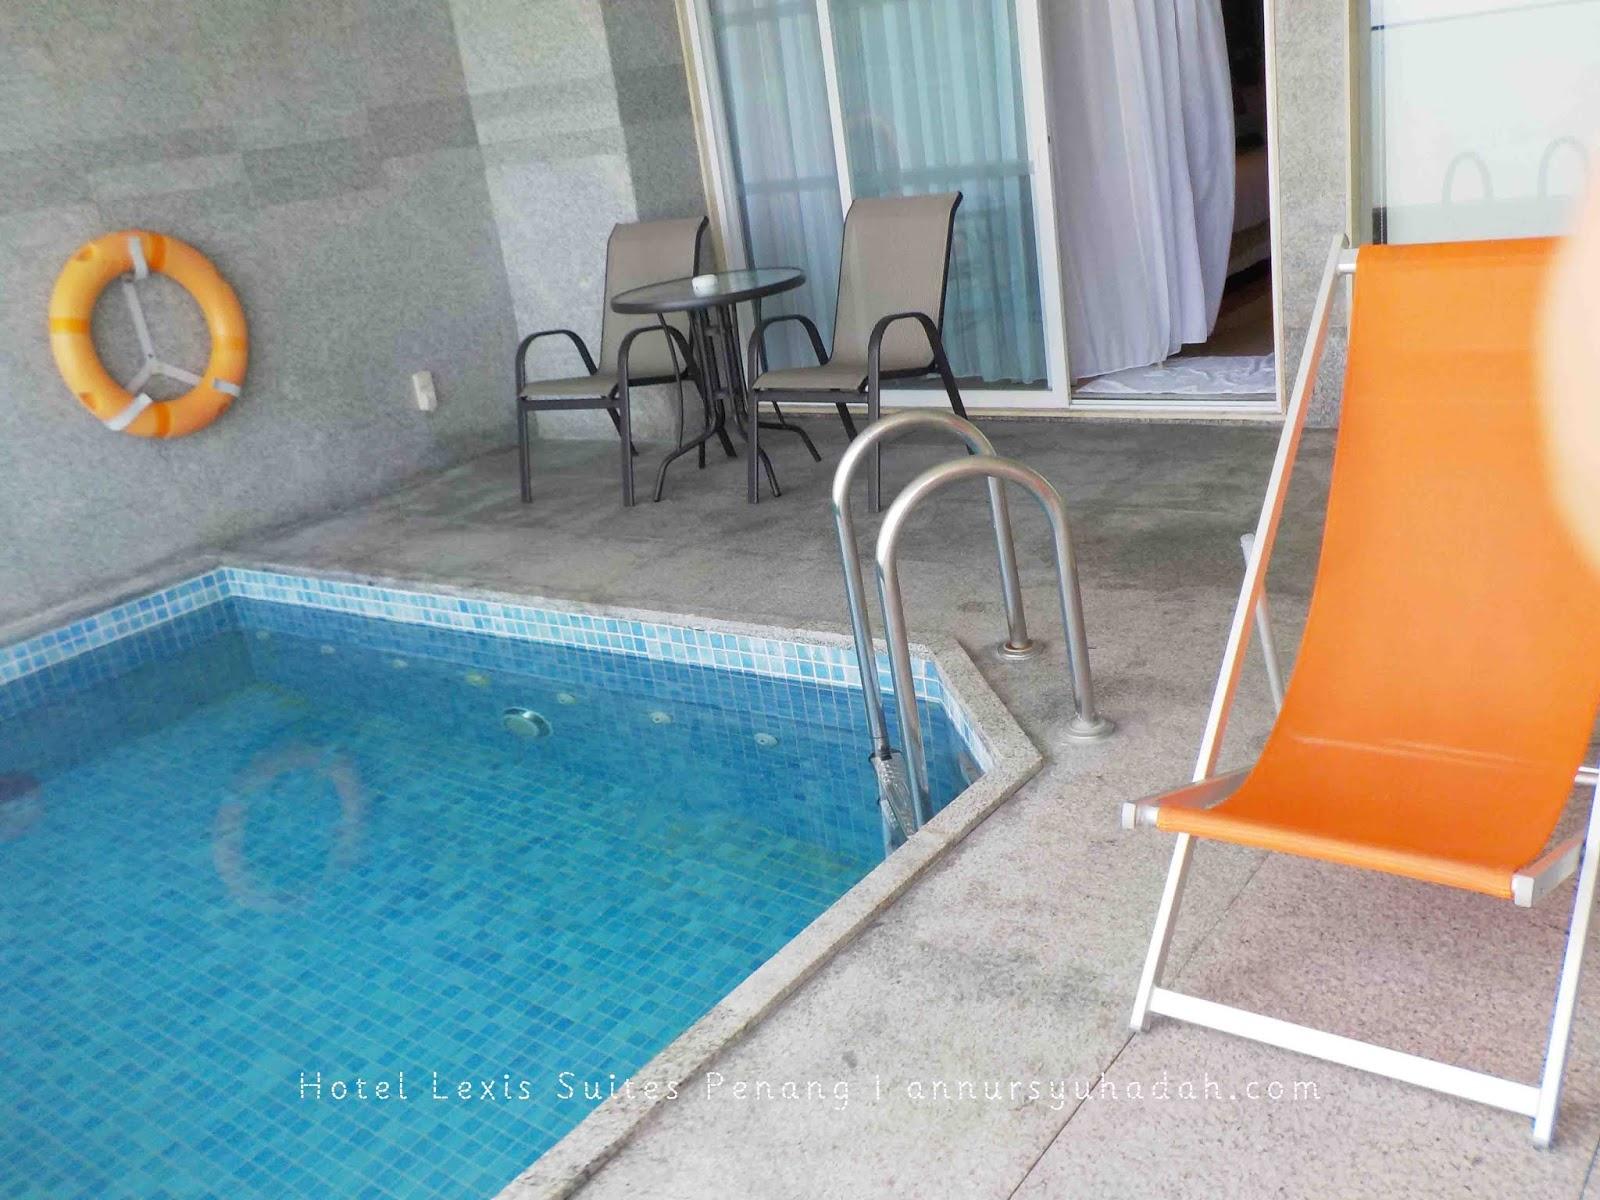 harga Hotel Lexis Suites Penang